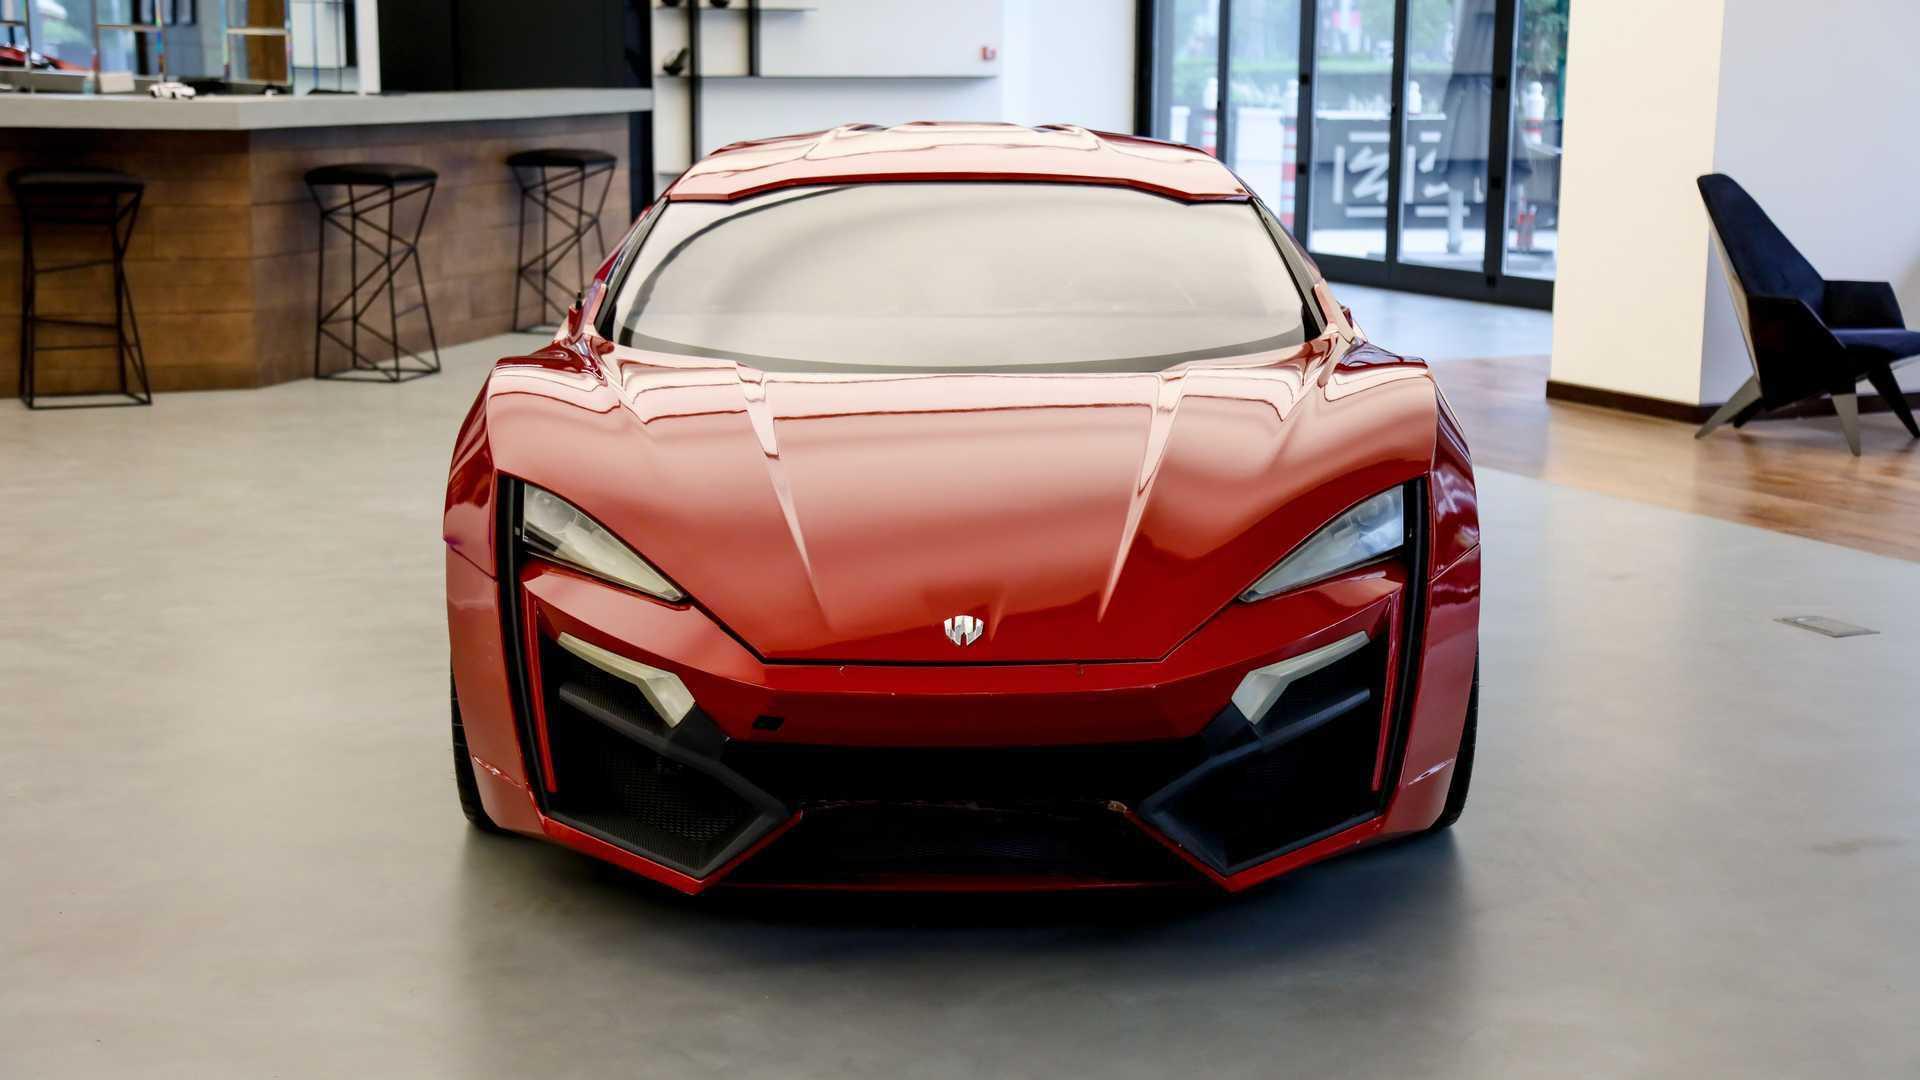 Lykan_HyperSport_stunt_car_sale-0002